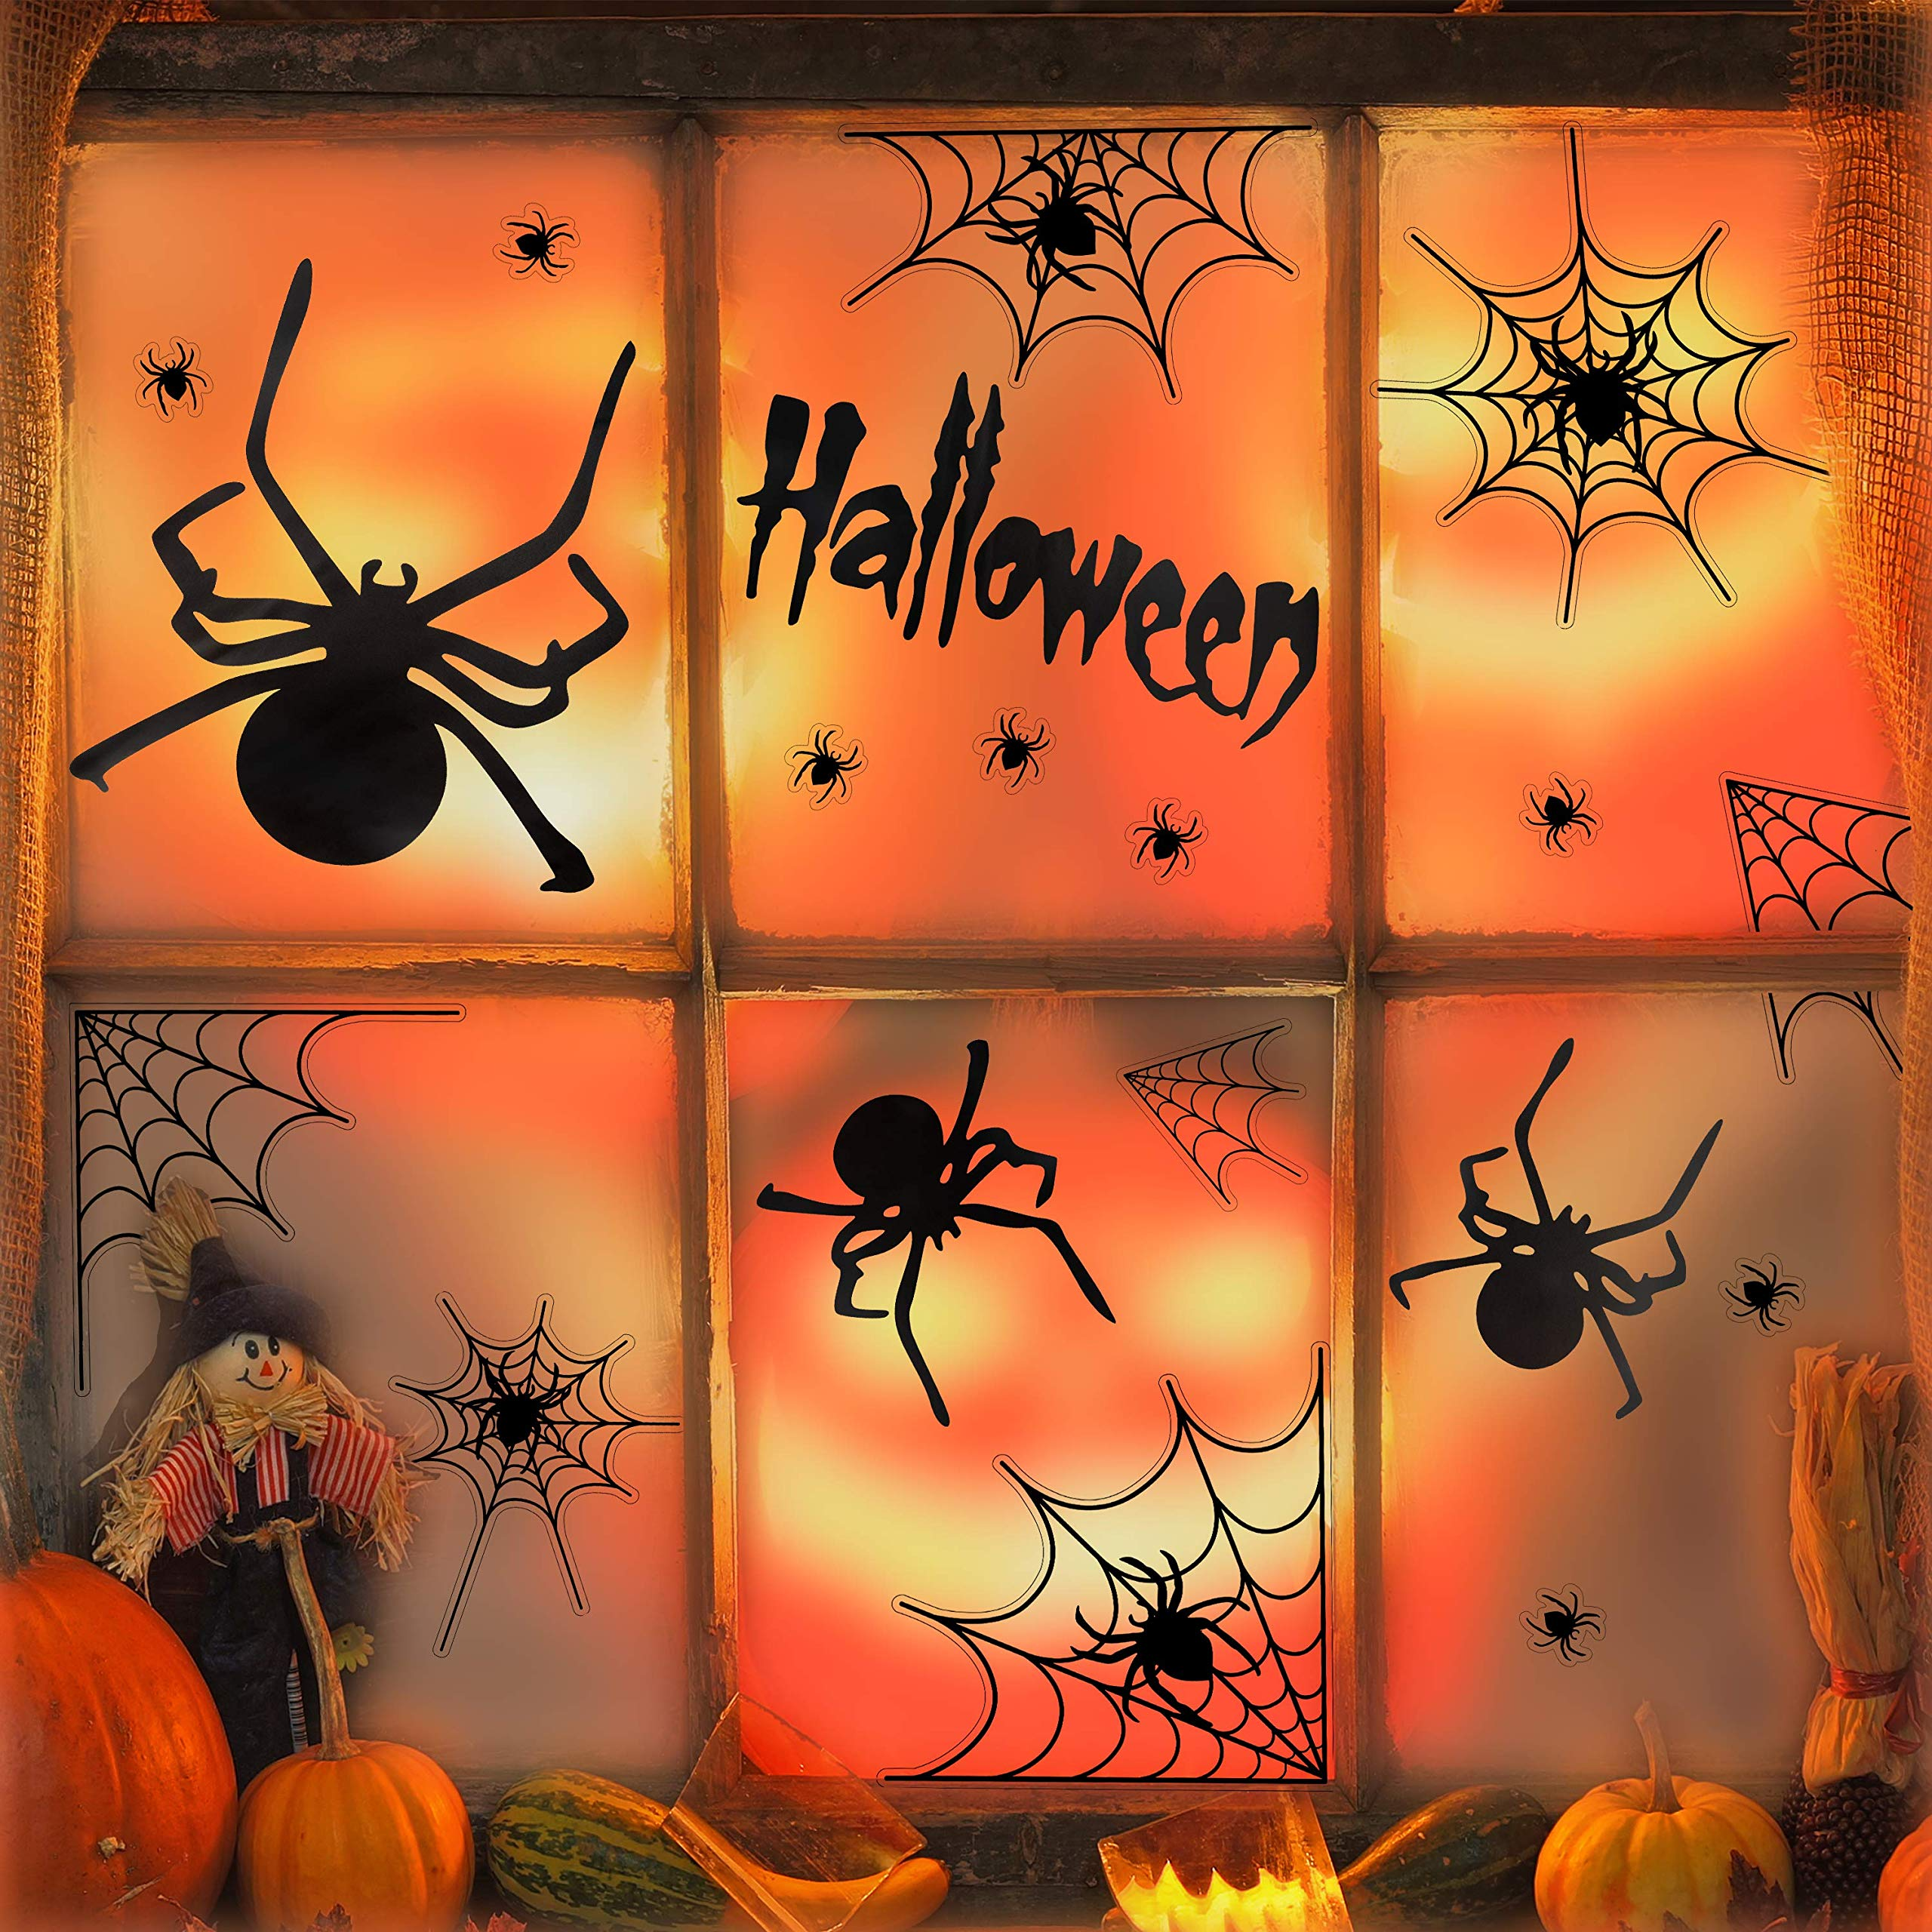 UNEEDE Halloween Decoration Spider Stickers Halloween Spider and Webs Wall Decals Vinyl Window Clings Set Halloween Eve Decor for Kids Rooms, Classrooms, Bedroom, Halloween Party by UNEEDE